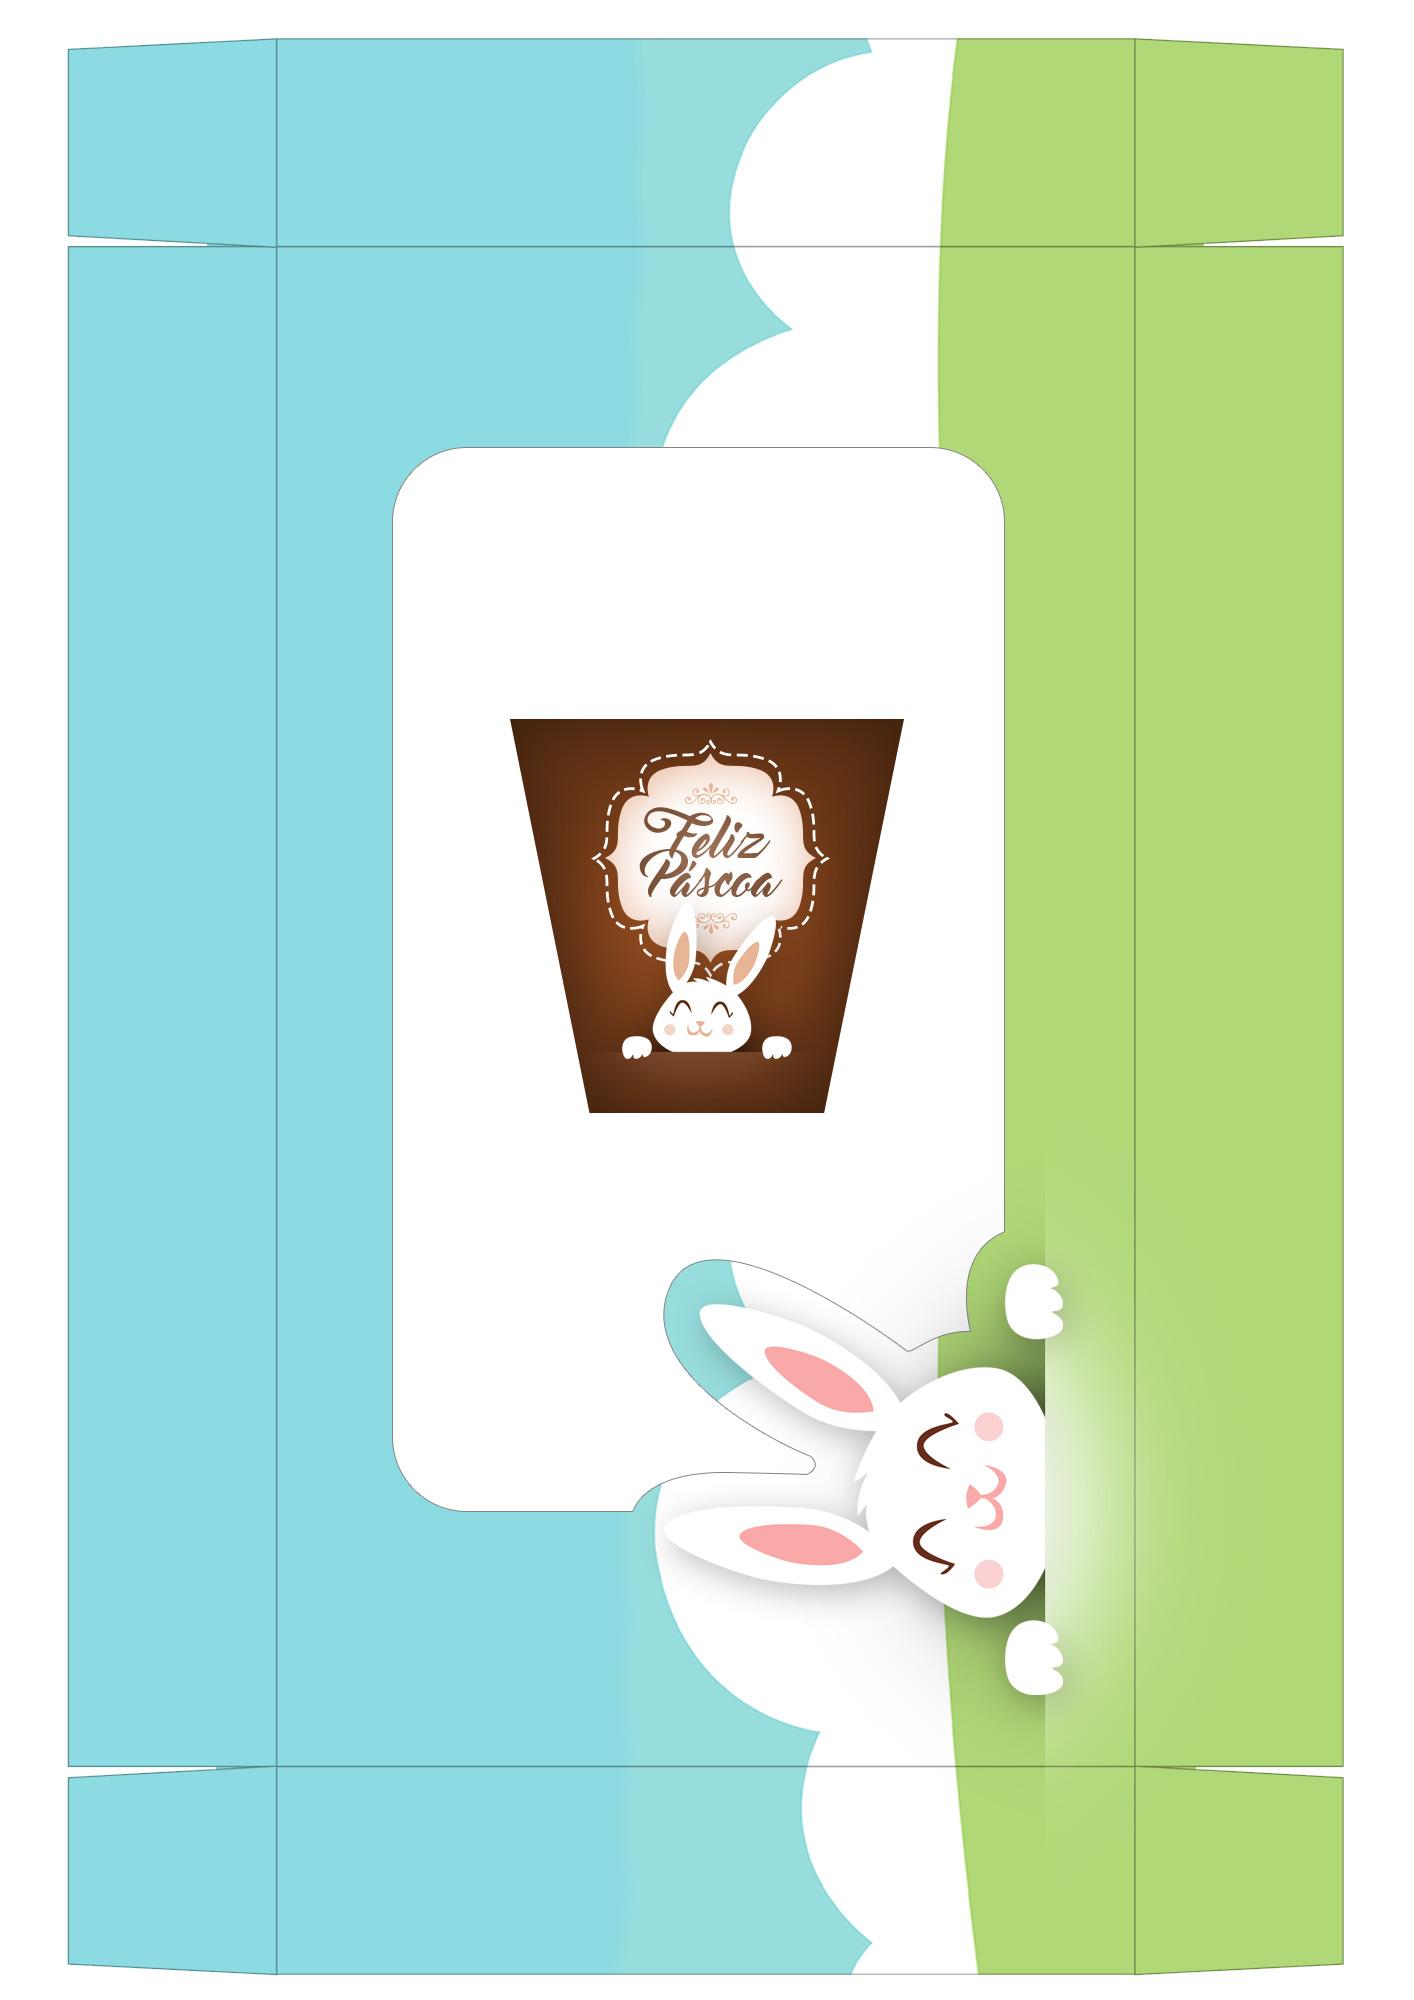 Caixa Kit Mini Confeiteiro para Páscoa 10 - parte de cima